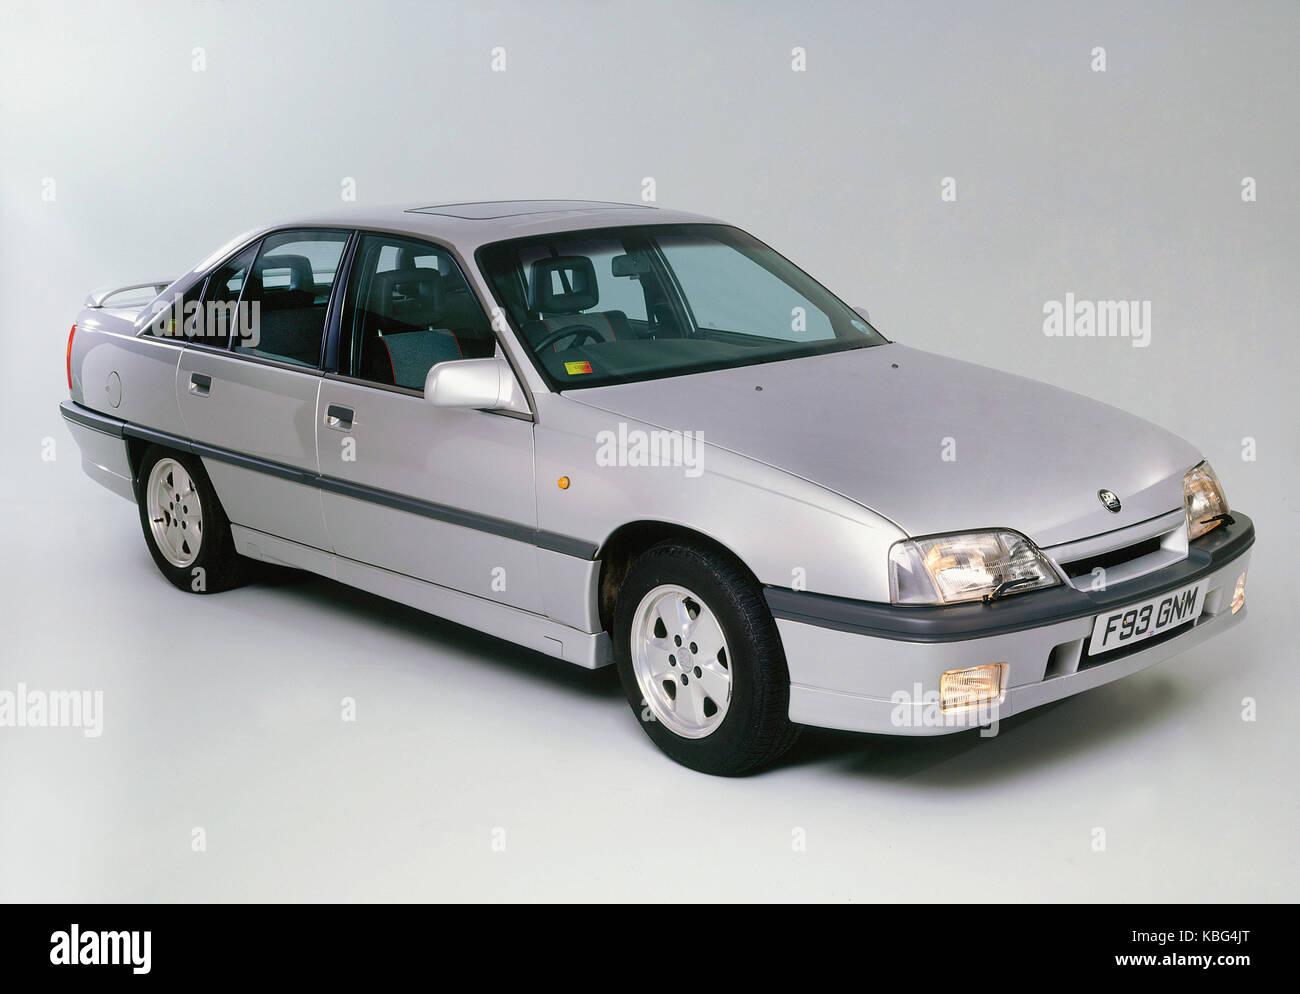 1989 Vauxhall Carlton 3.0 GSi - Stock Image